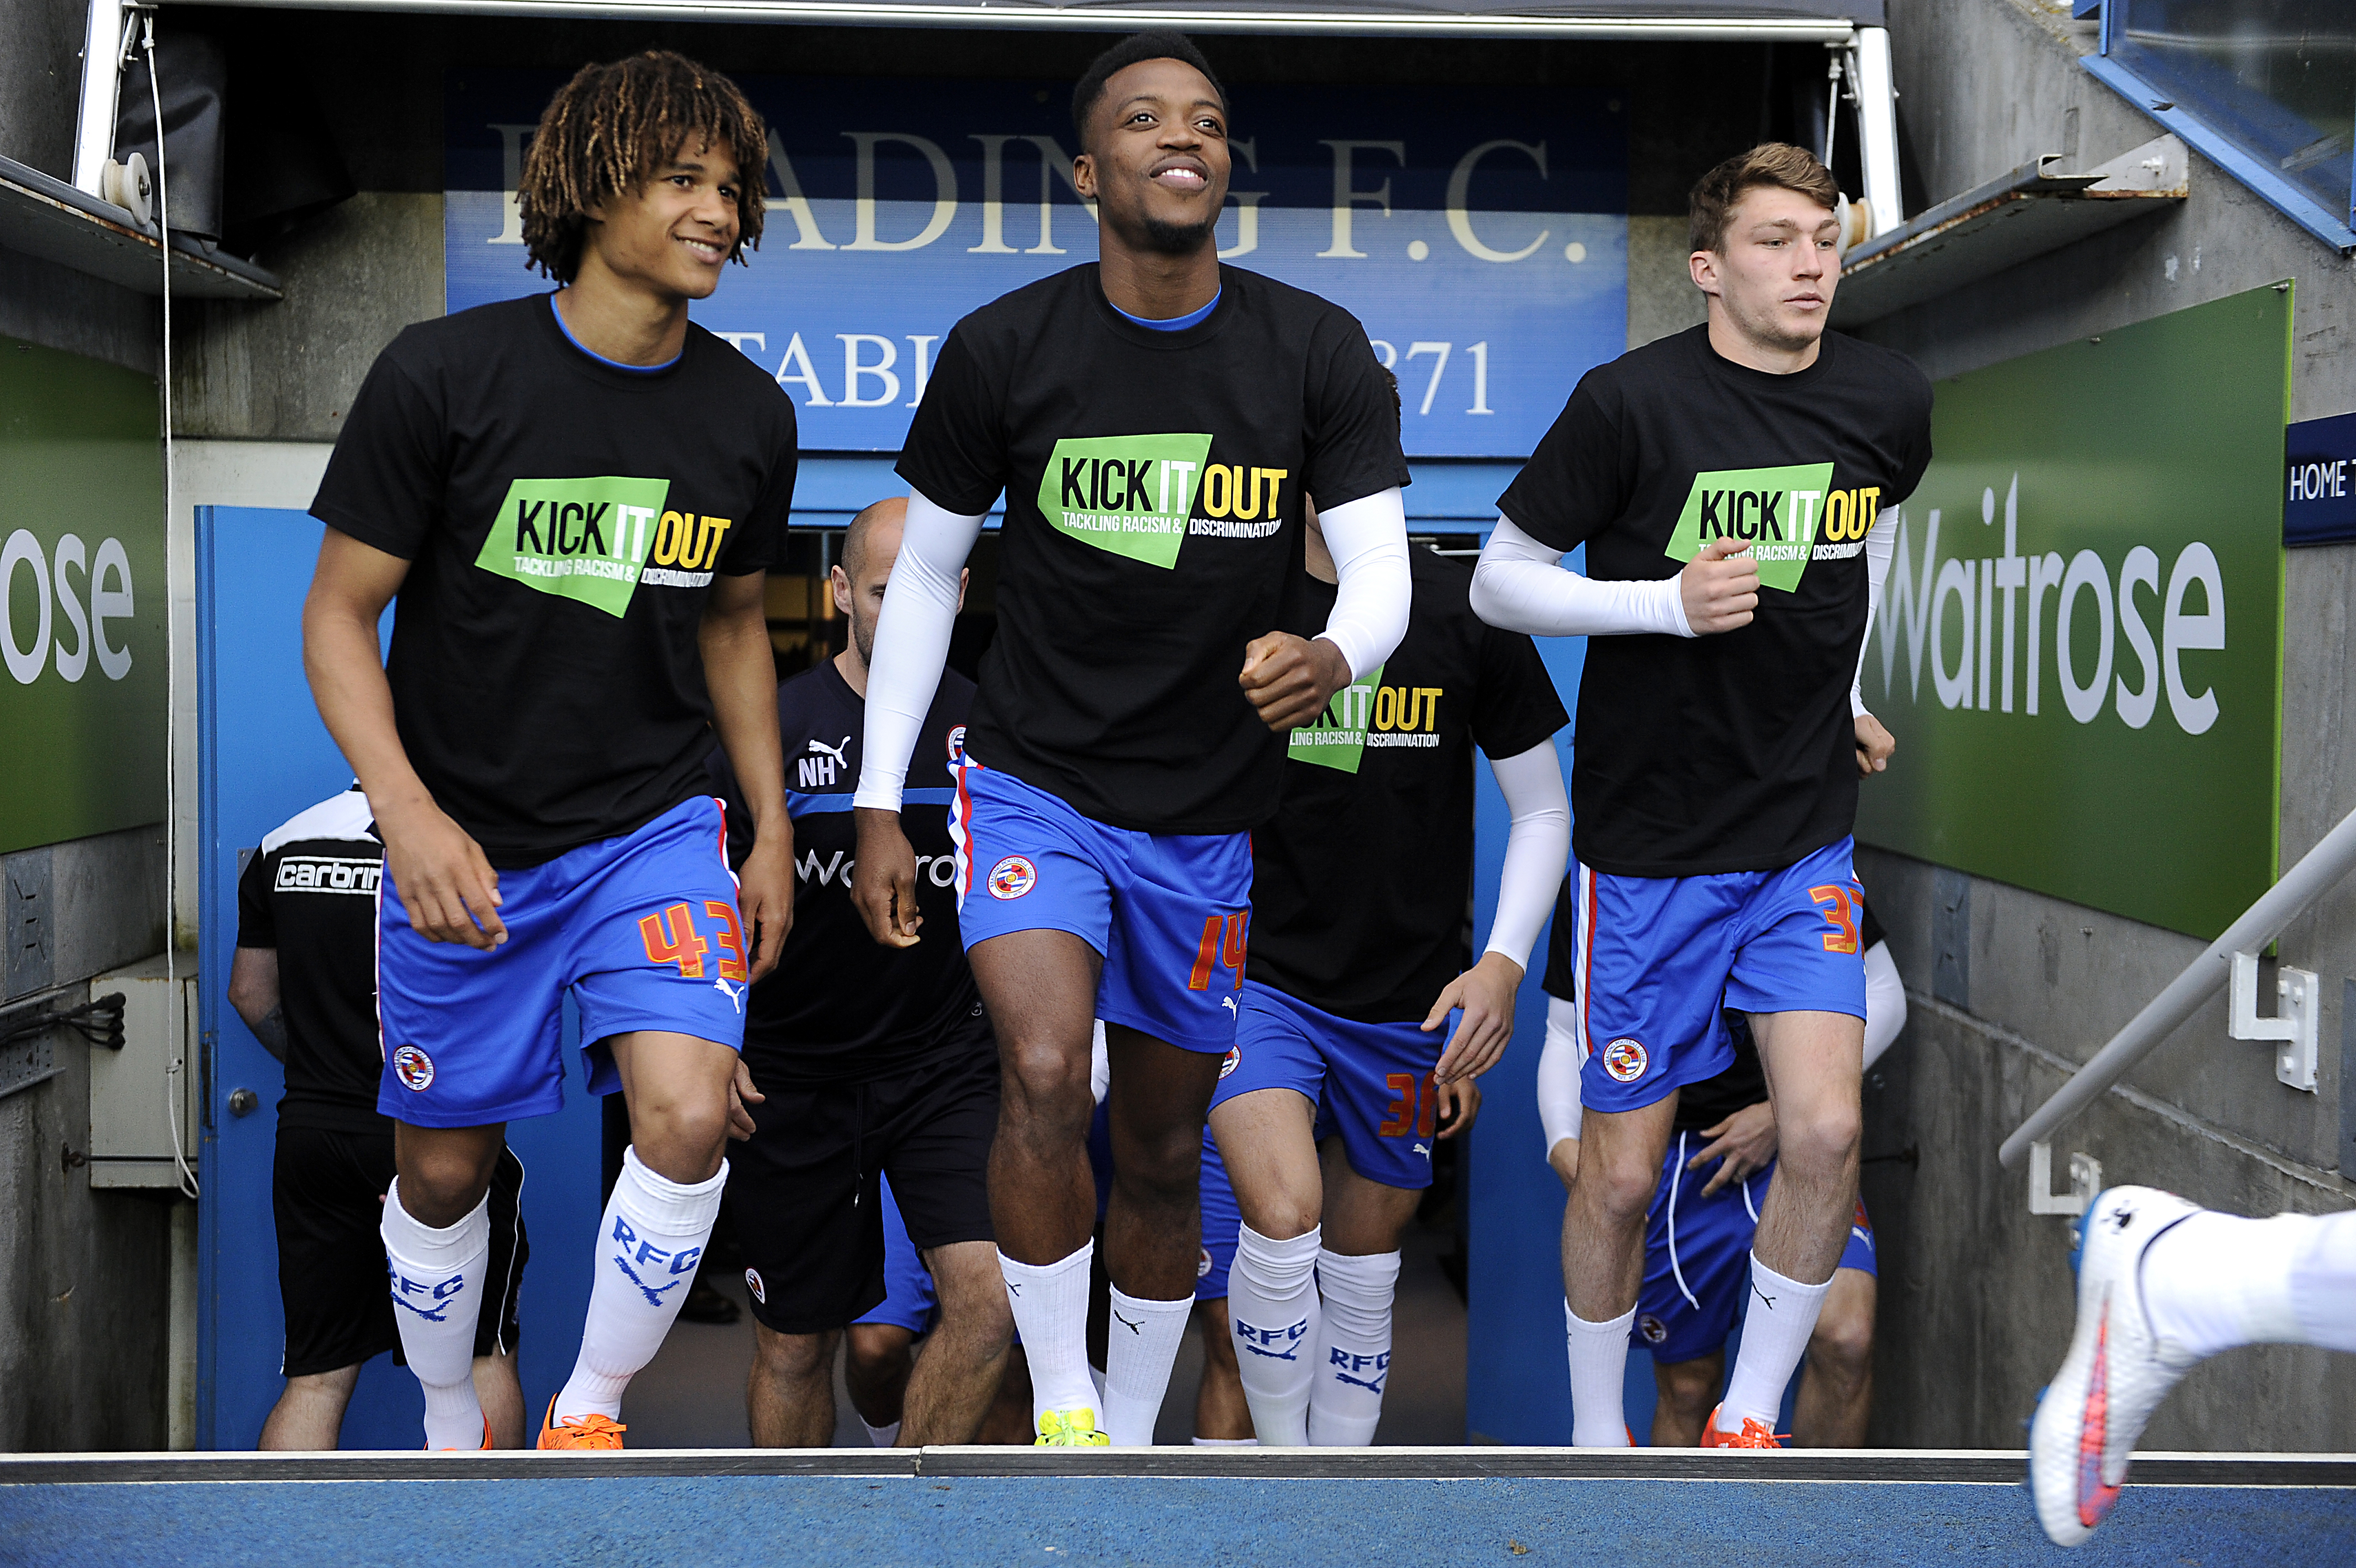 Soccer - Sky Bet Championship - Reading v Birmingham City - Madejski Stadium